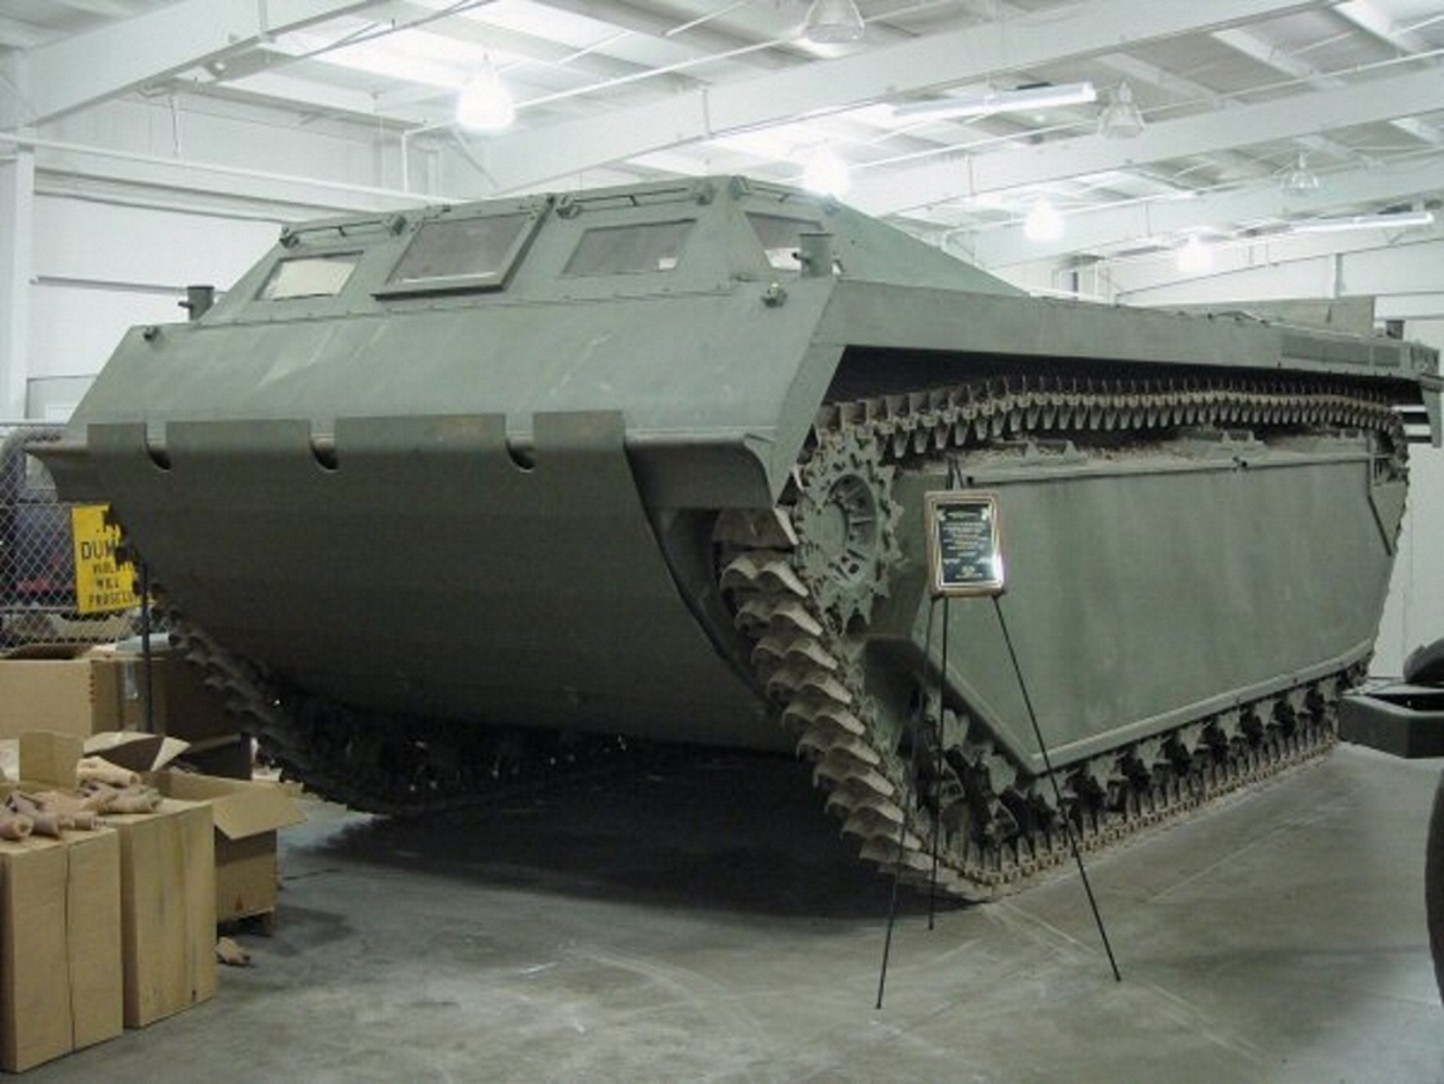 USMC LVT-3